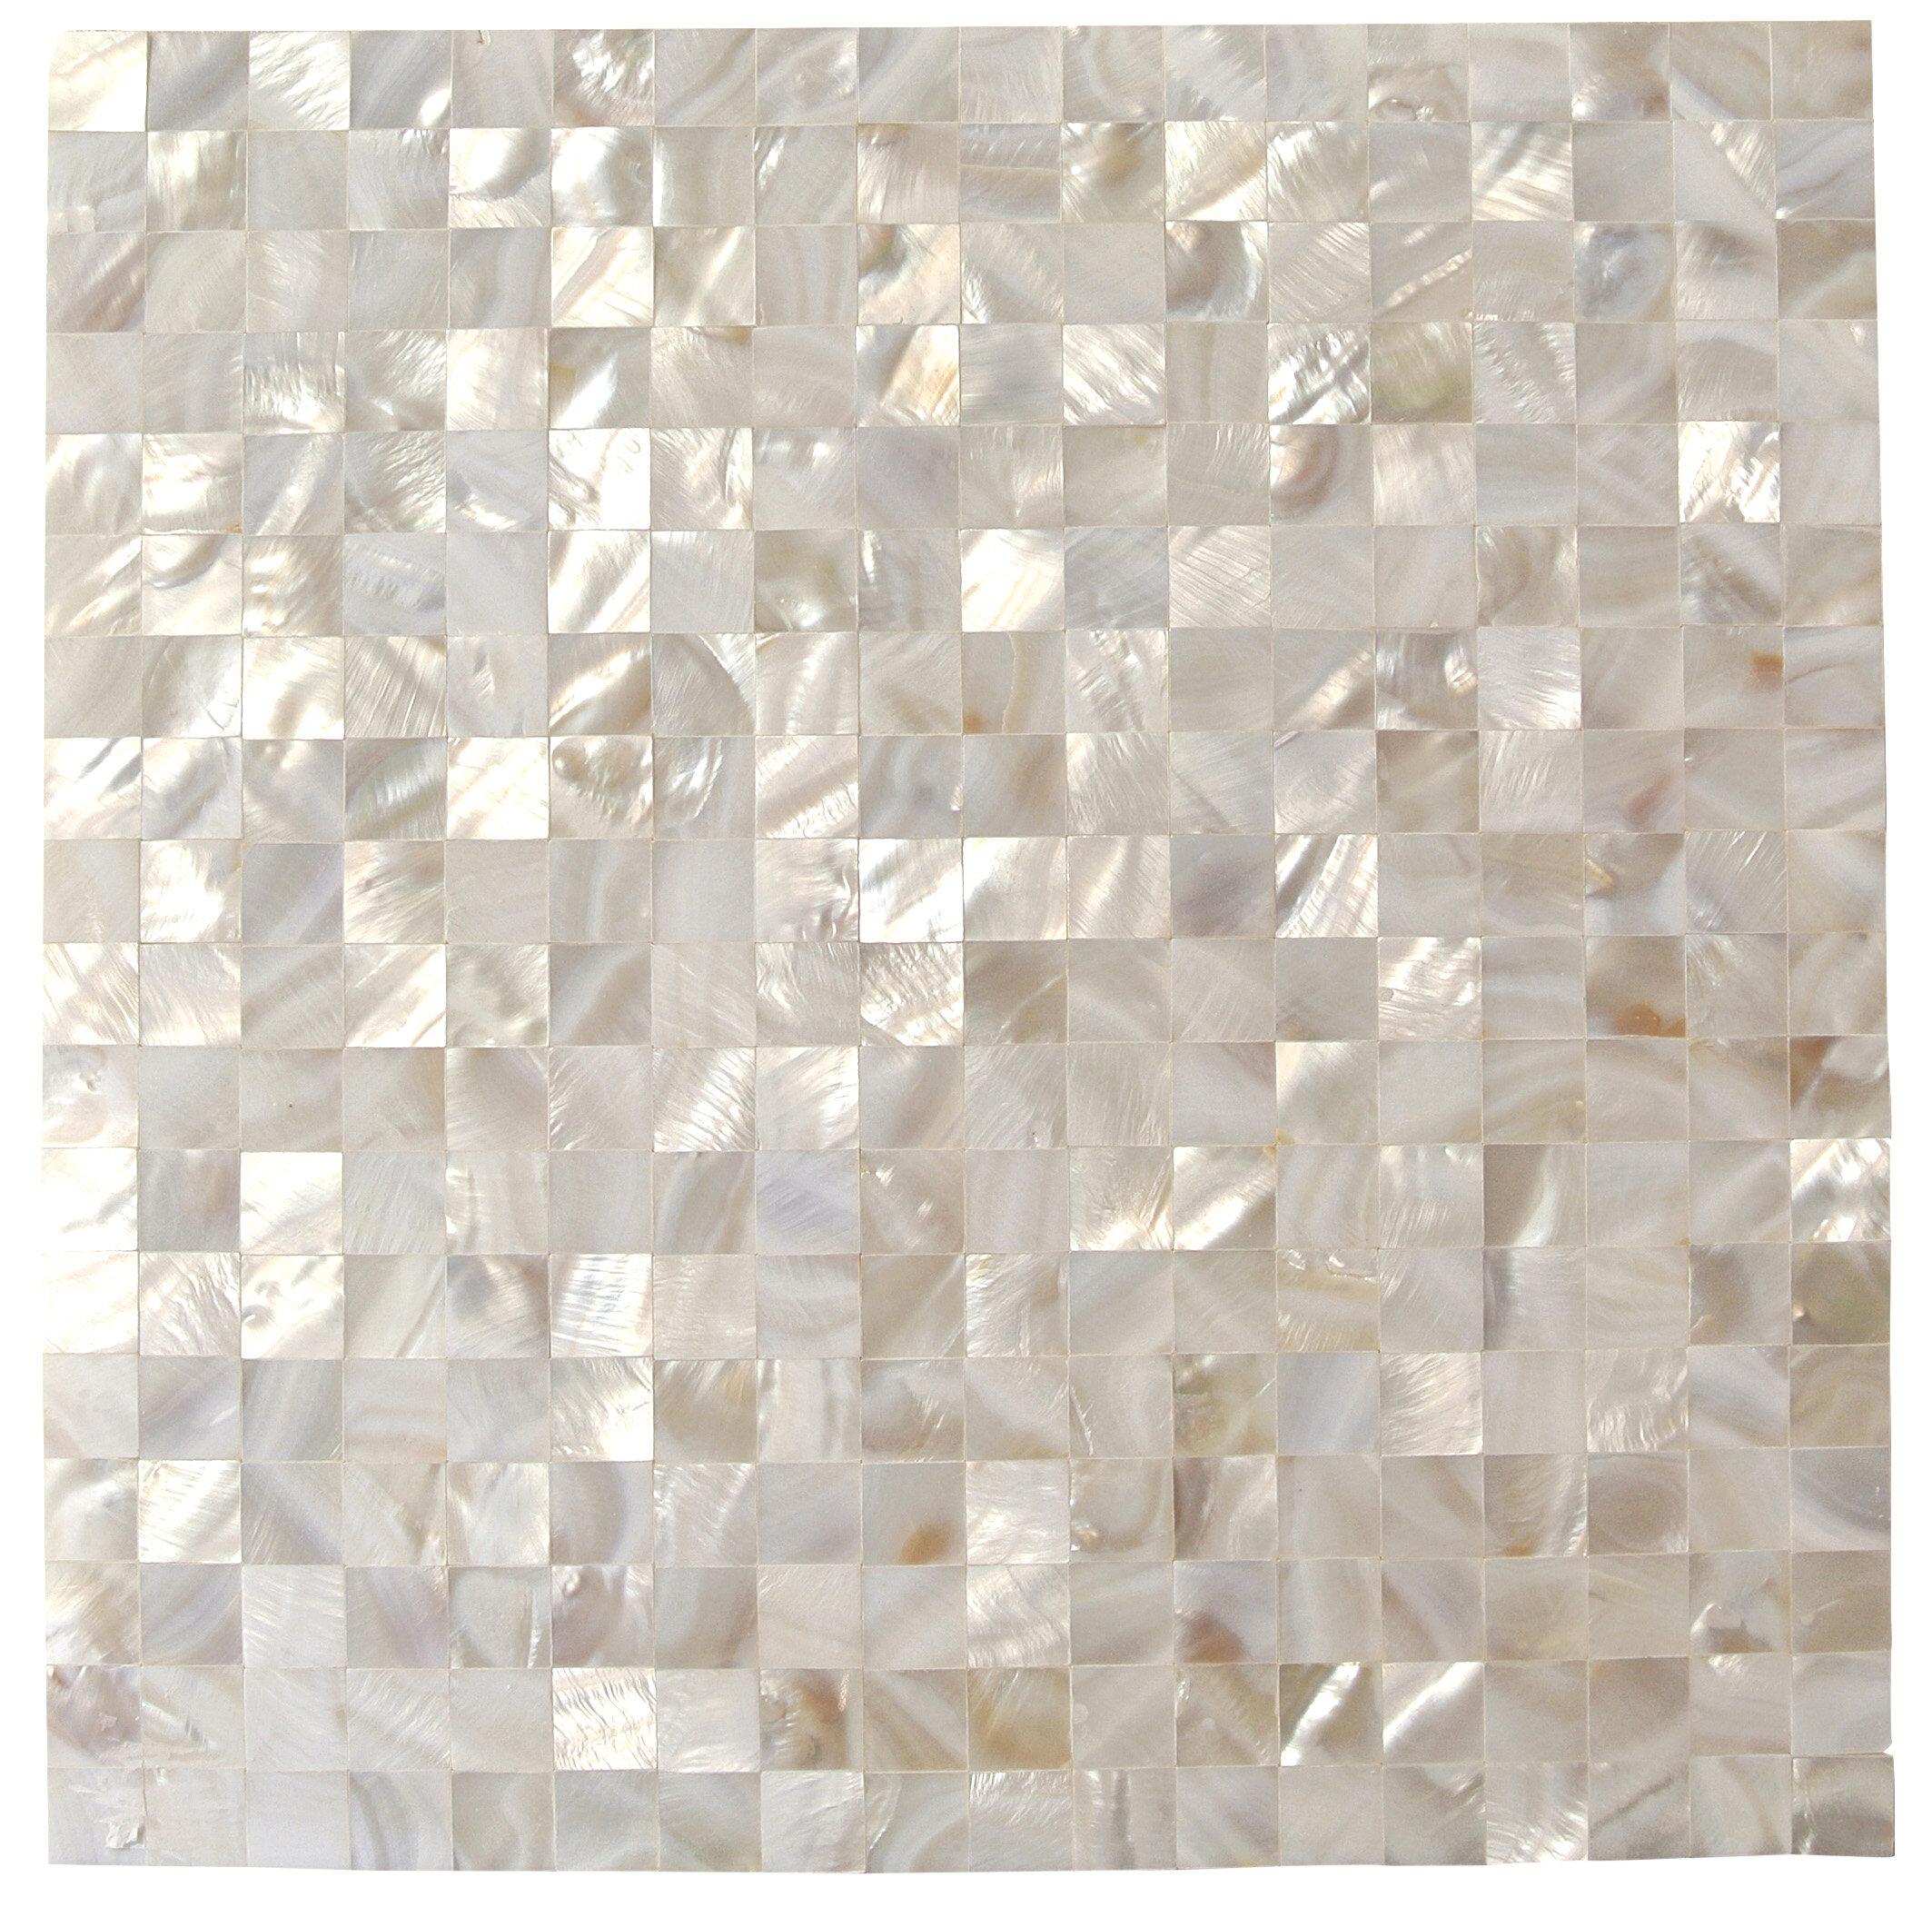 Splashback Tile Lokahi 66 X Gl Pearl Shell Mosaic In White Reviews Wayfair